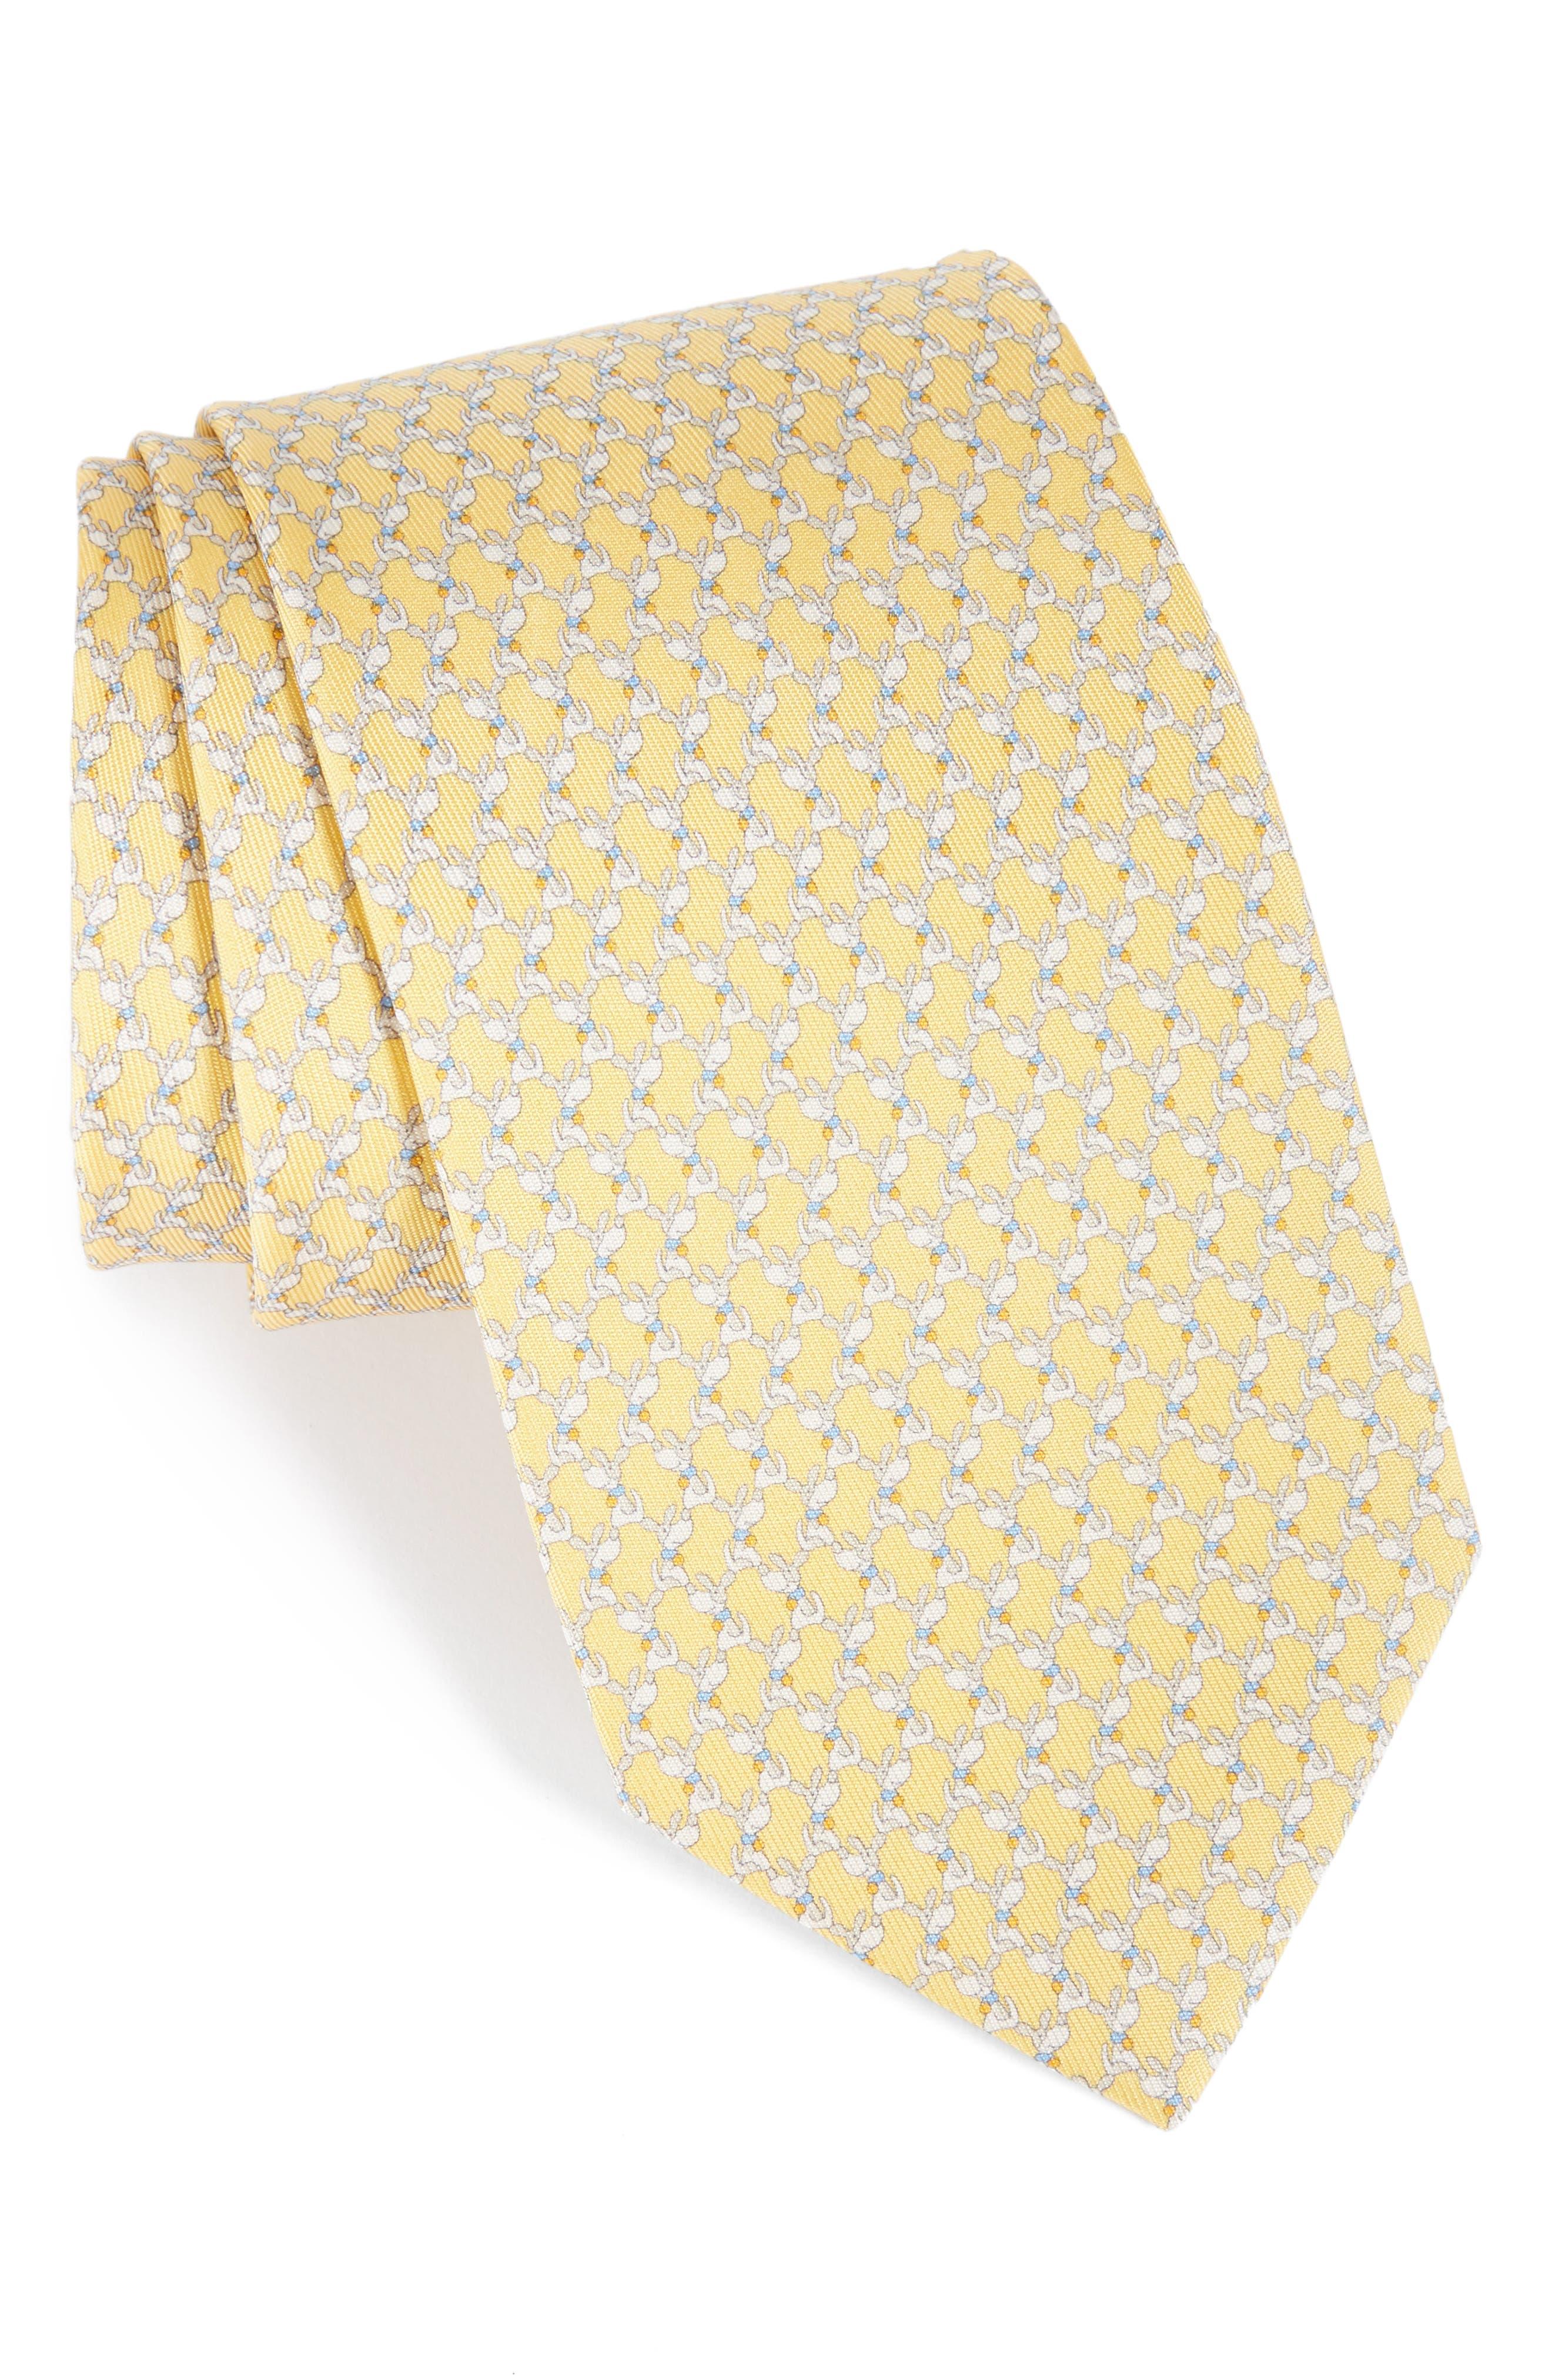 Alternate Image 1 Selected - Salvatore Ferragamo Riccardo Dog Print Silk Tie